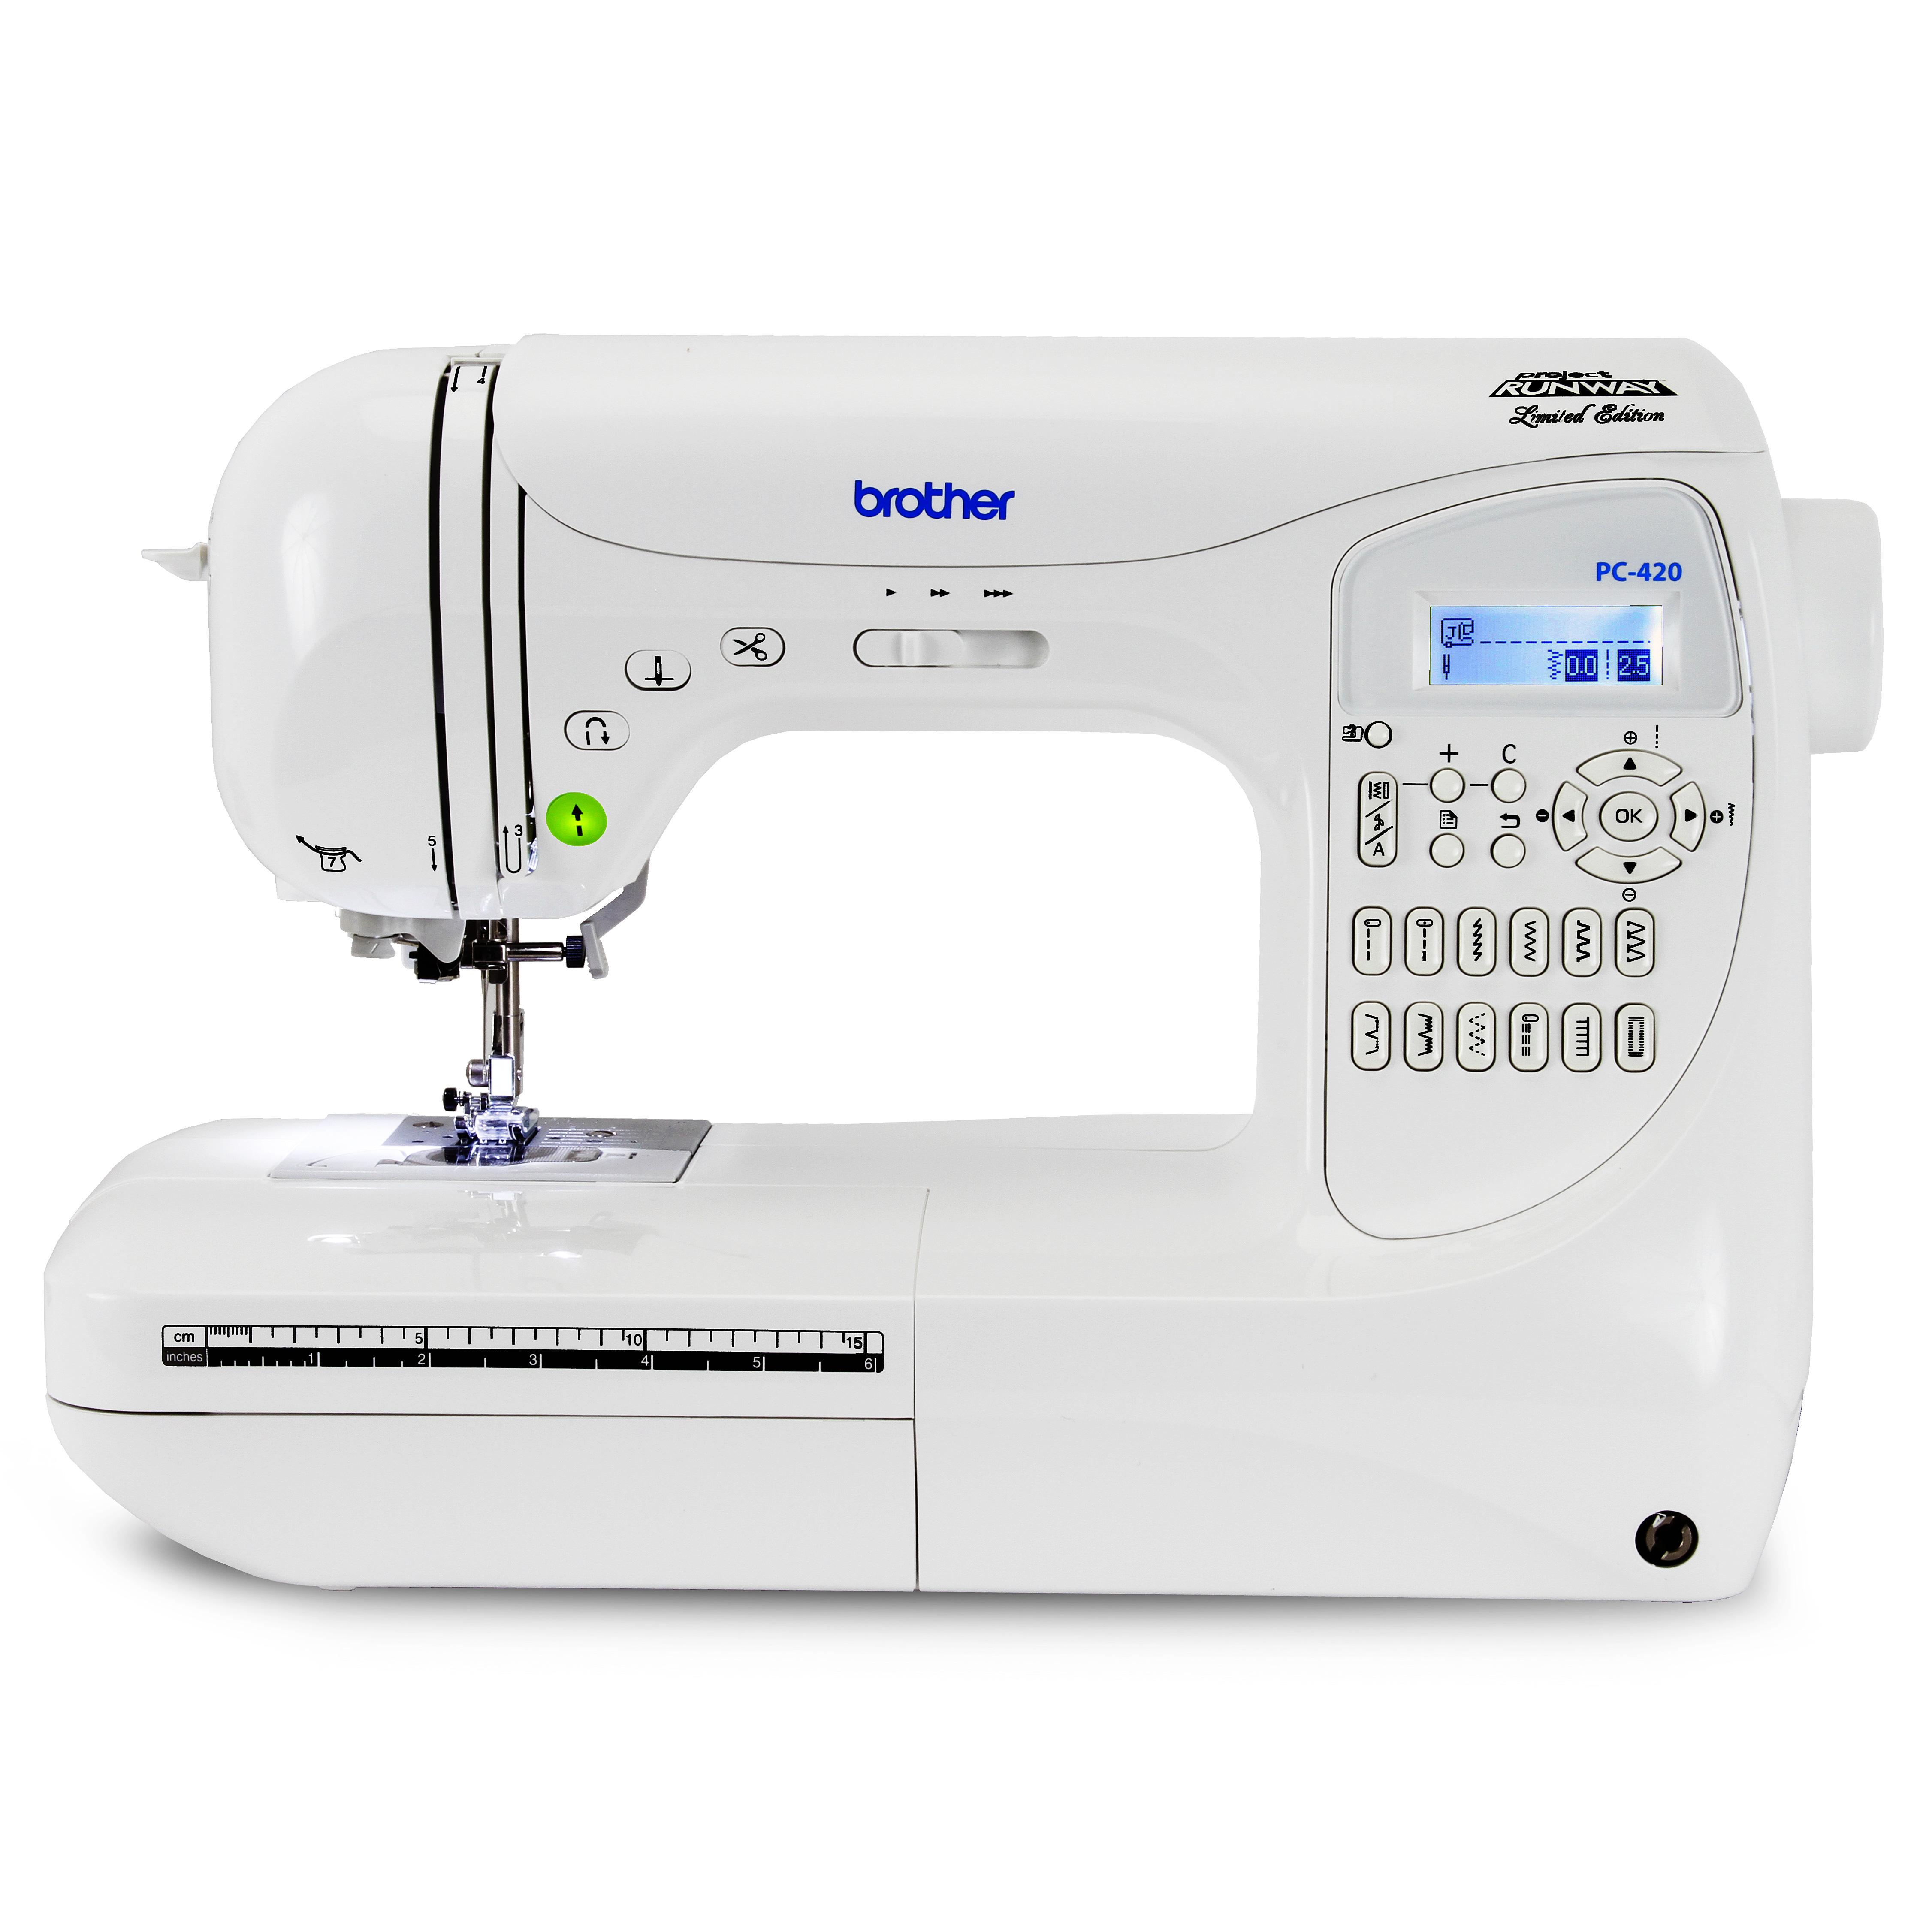 pc 420 sewing machine